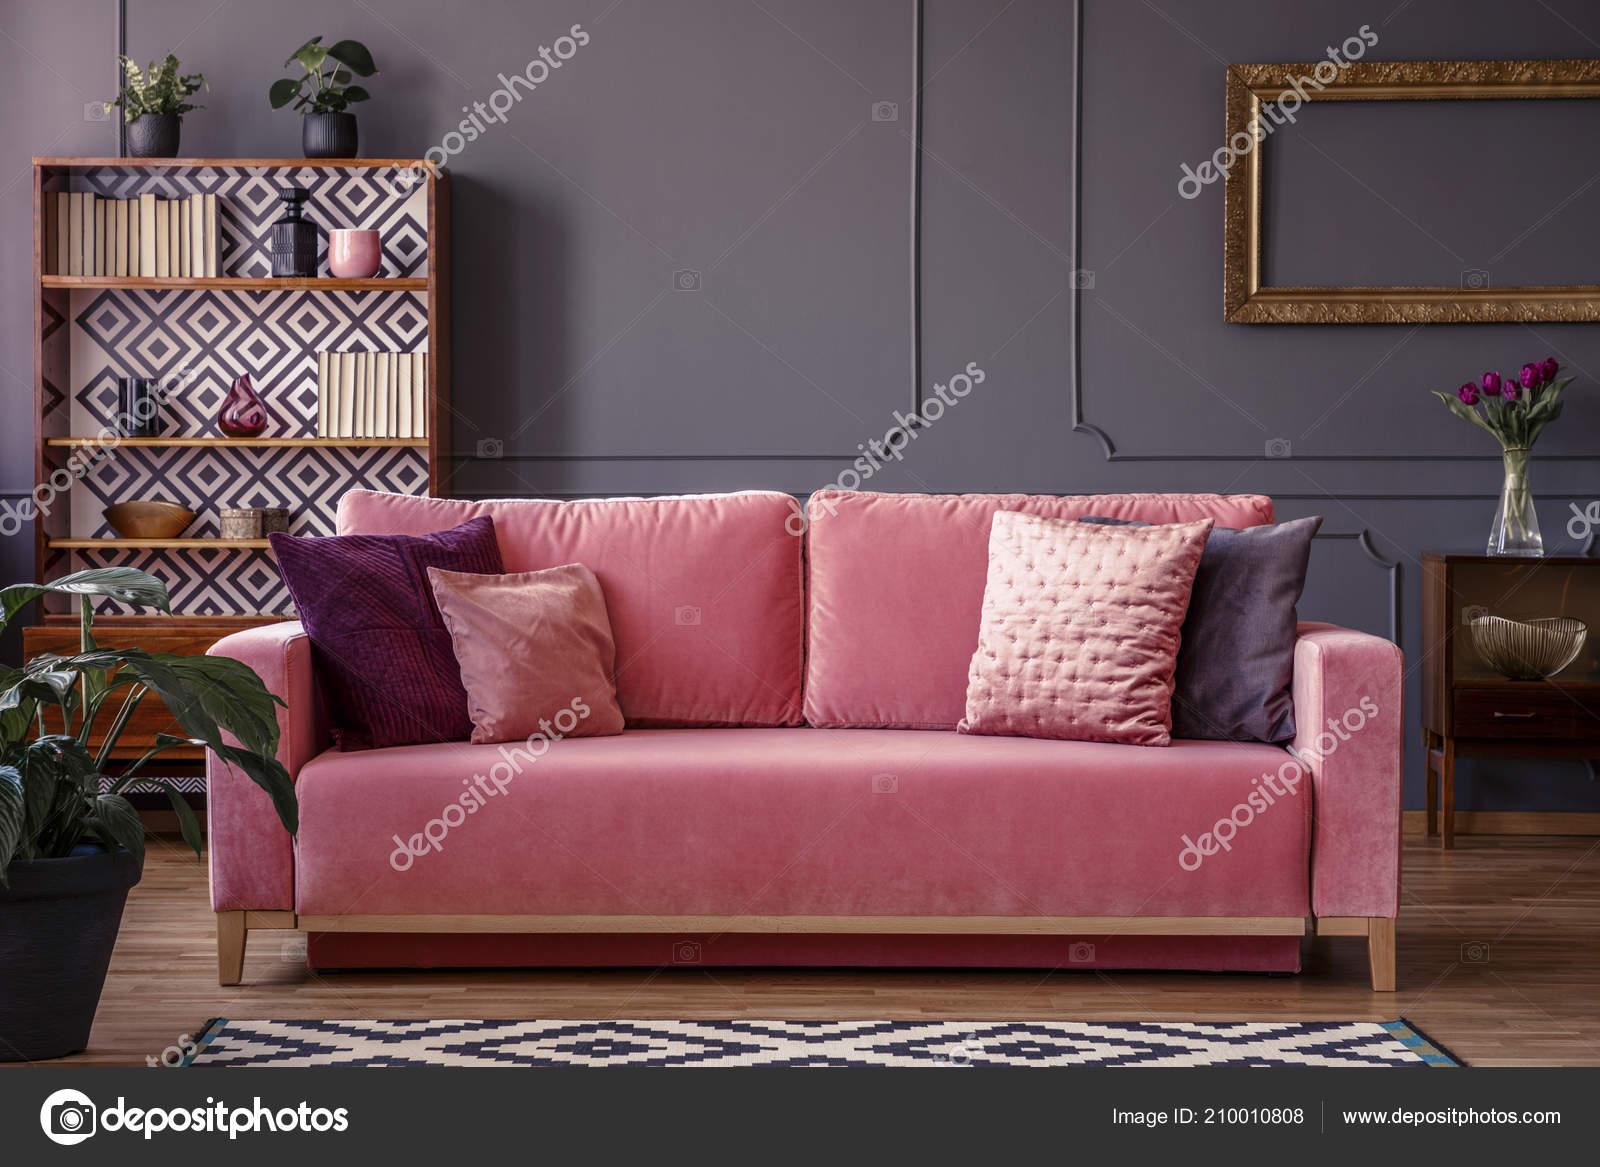 Peachy Satin Pillows Pink Velvet Sofa Luxurious Living Room Machost Co Dining Chair Design Ideas Machostcouk